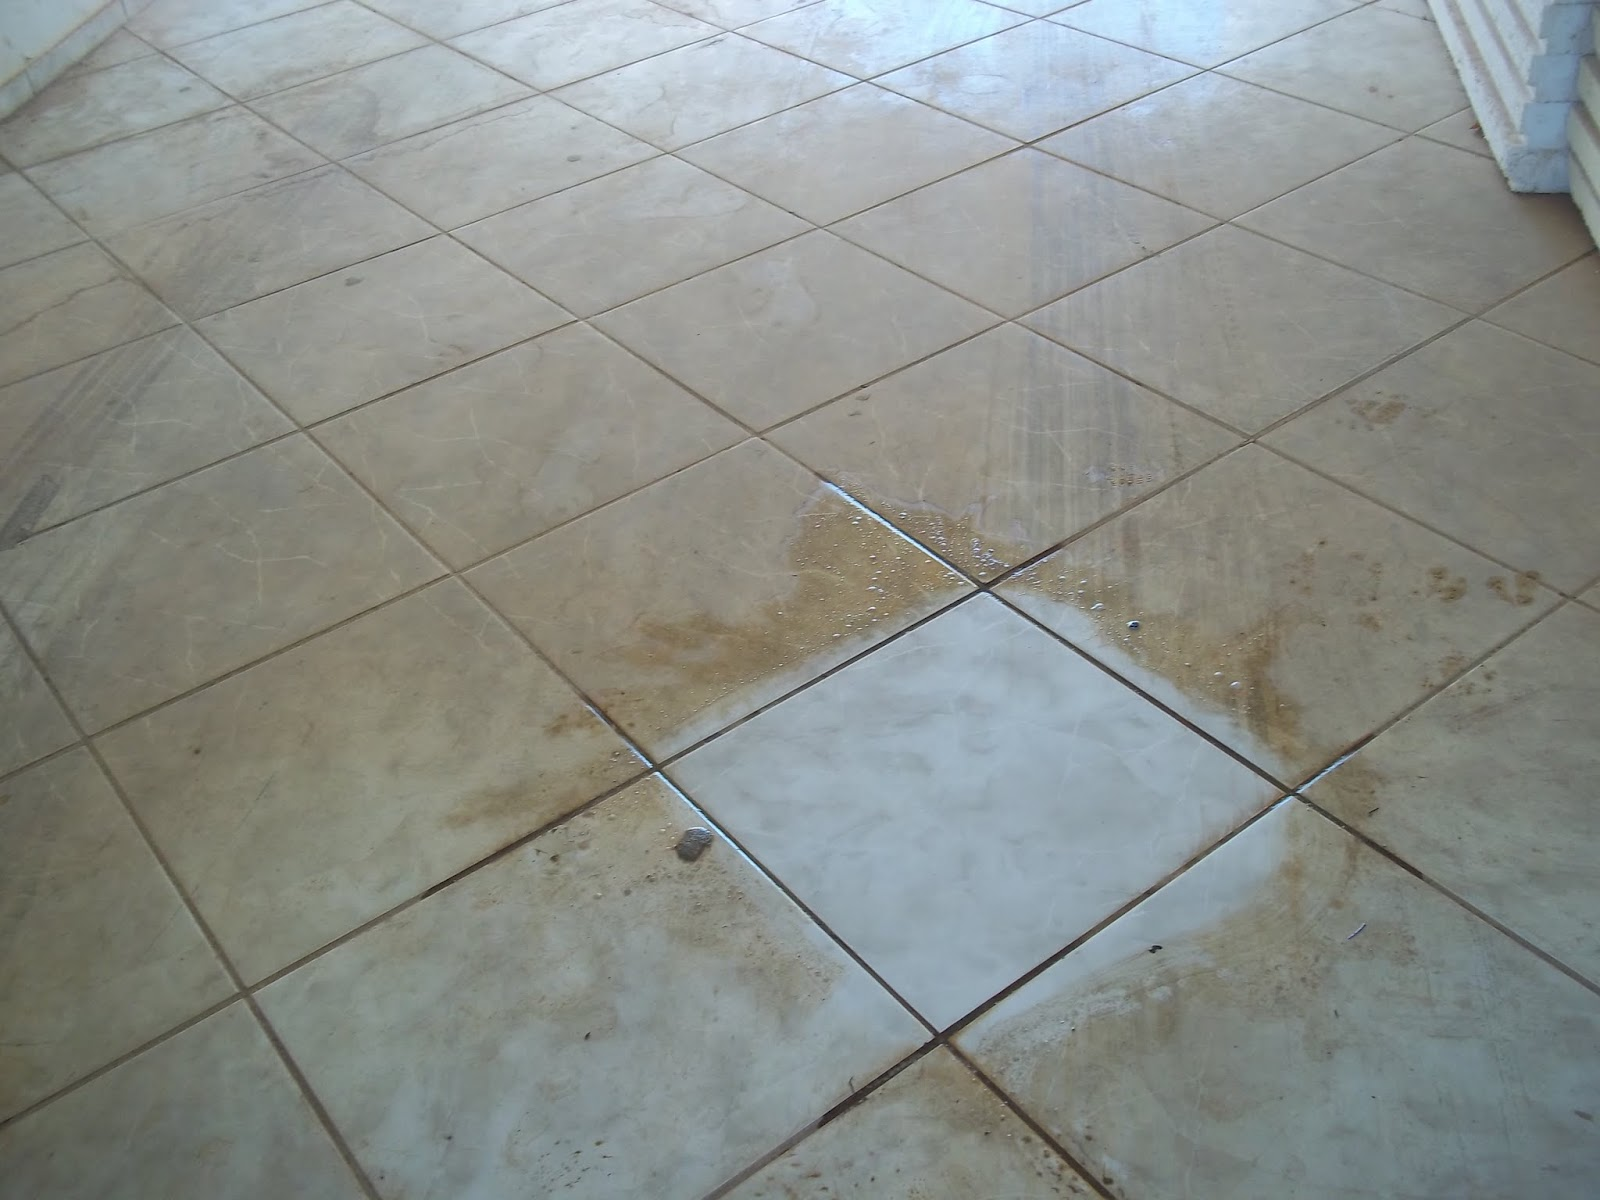 Limpando piso encardido Ideal Receitas #51687A 1600x1200 Banheiro Branco Como Limpar